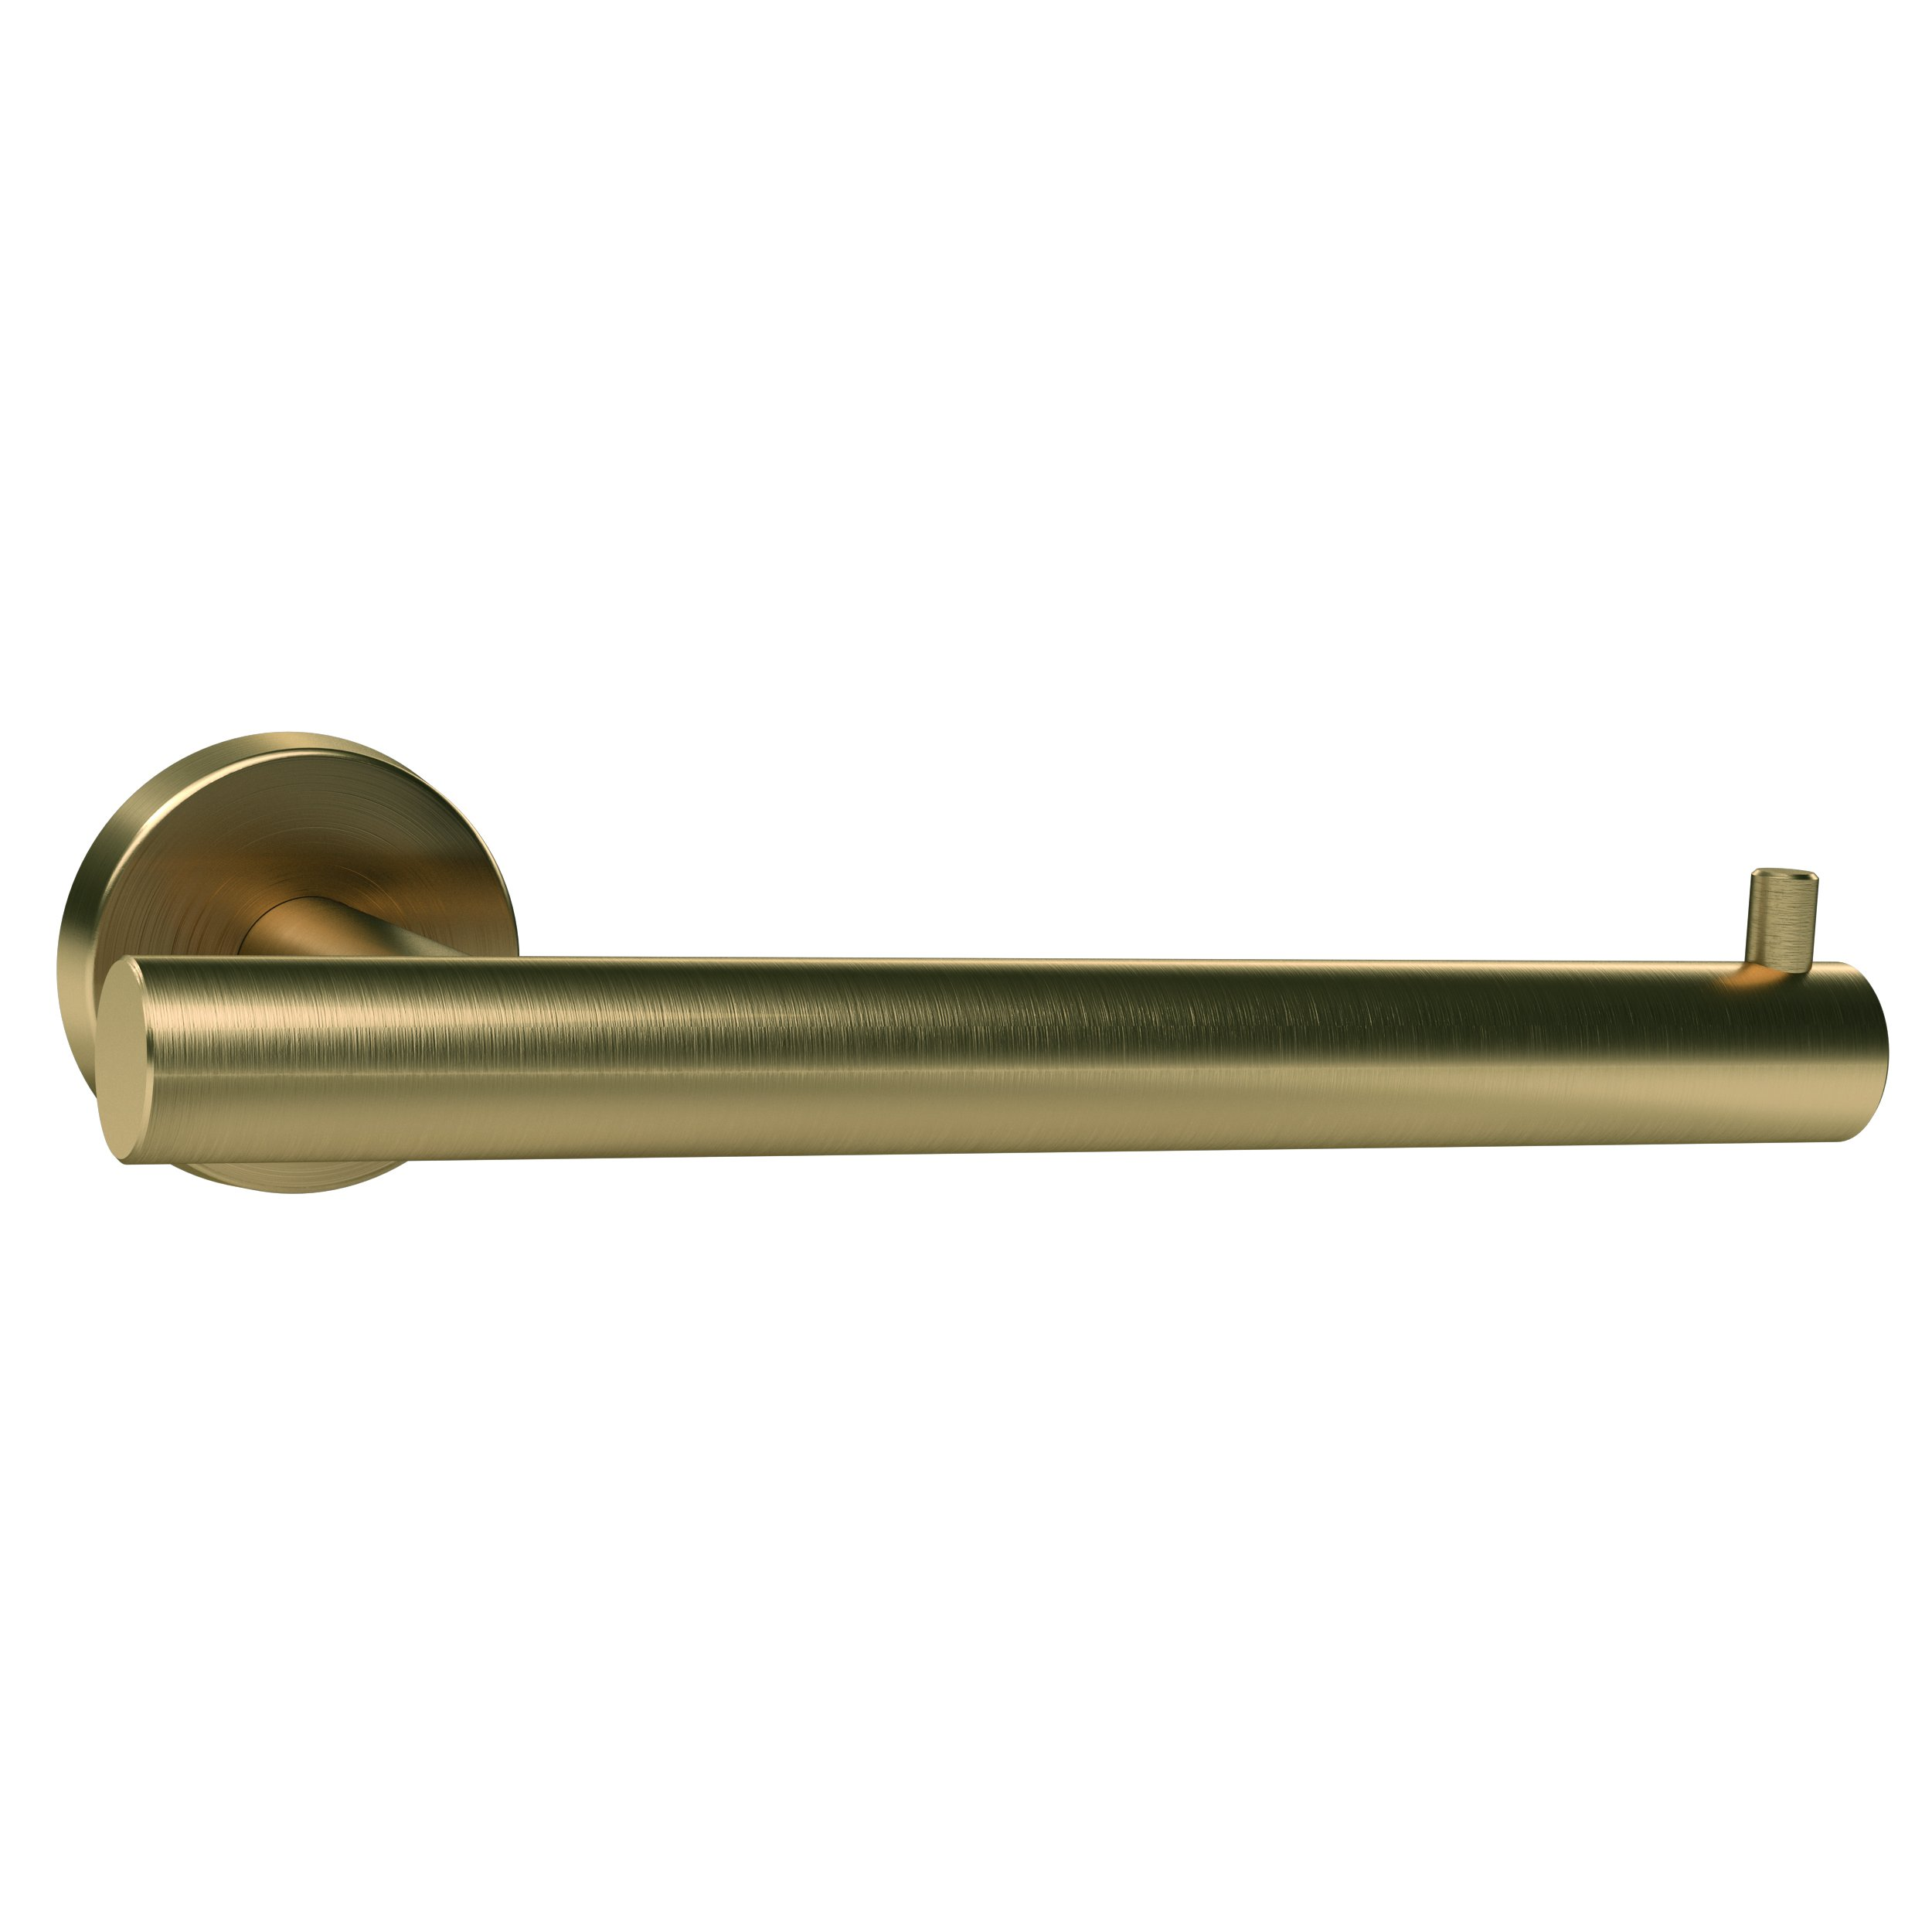 Amerock BH26540BBZ Arrondi Single Post Tissue Roll Holder in Brushed Bronze/Golden Champagne